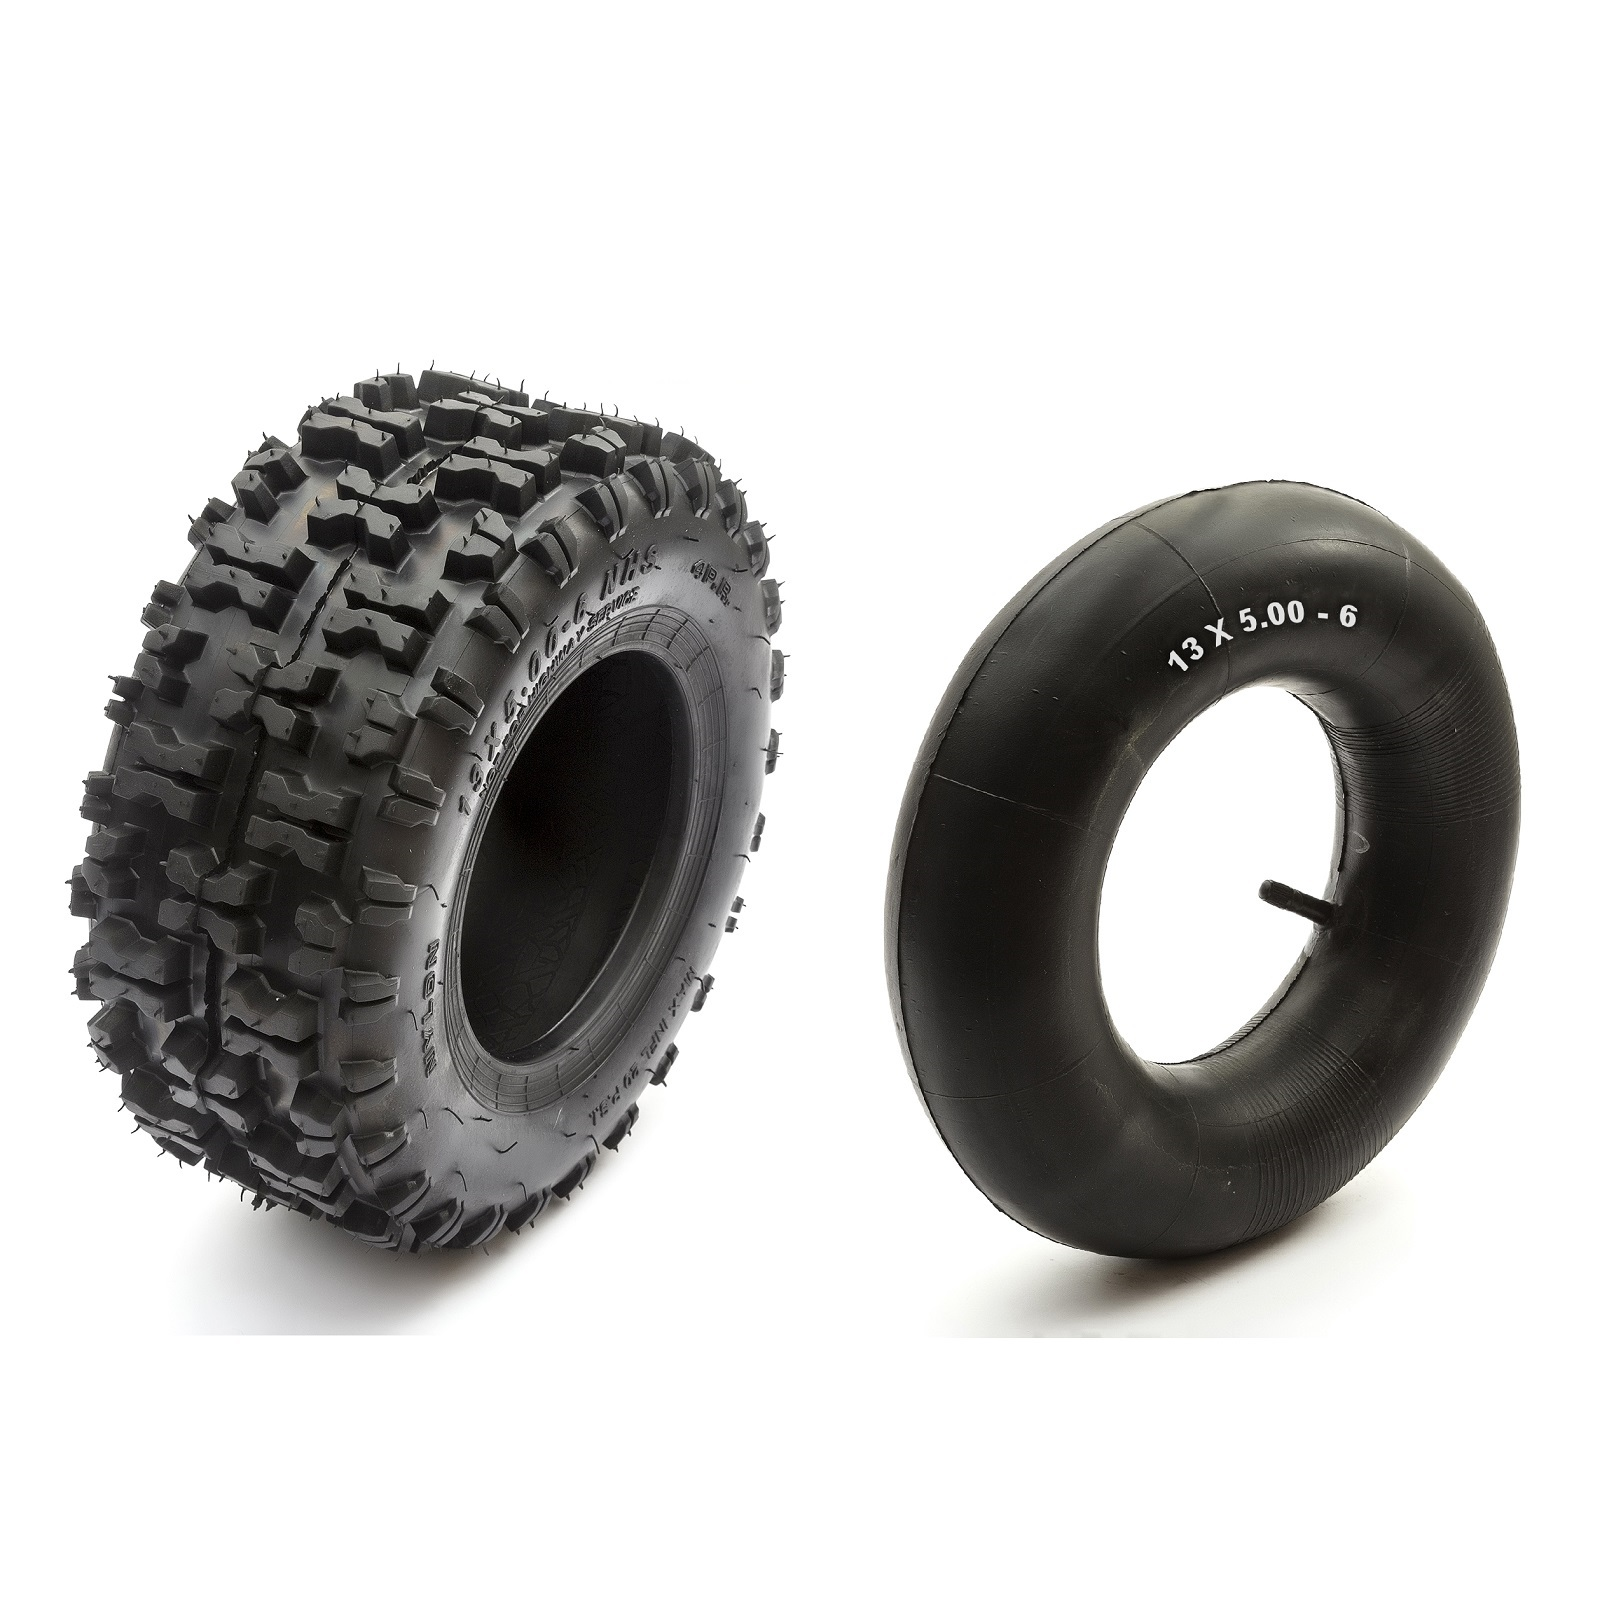 200cc 2 Gokart Knobbly Tyre 6 Inch 6 13x5.00-6 Rim Drifter Maxx Drift Kart 160cc